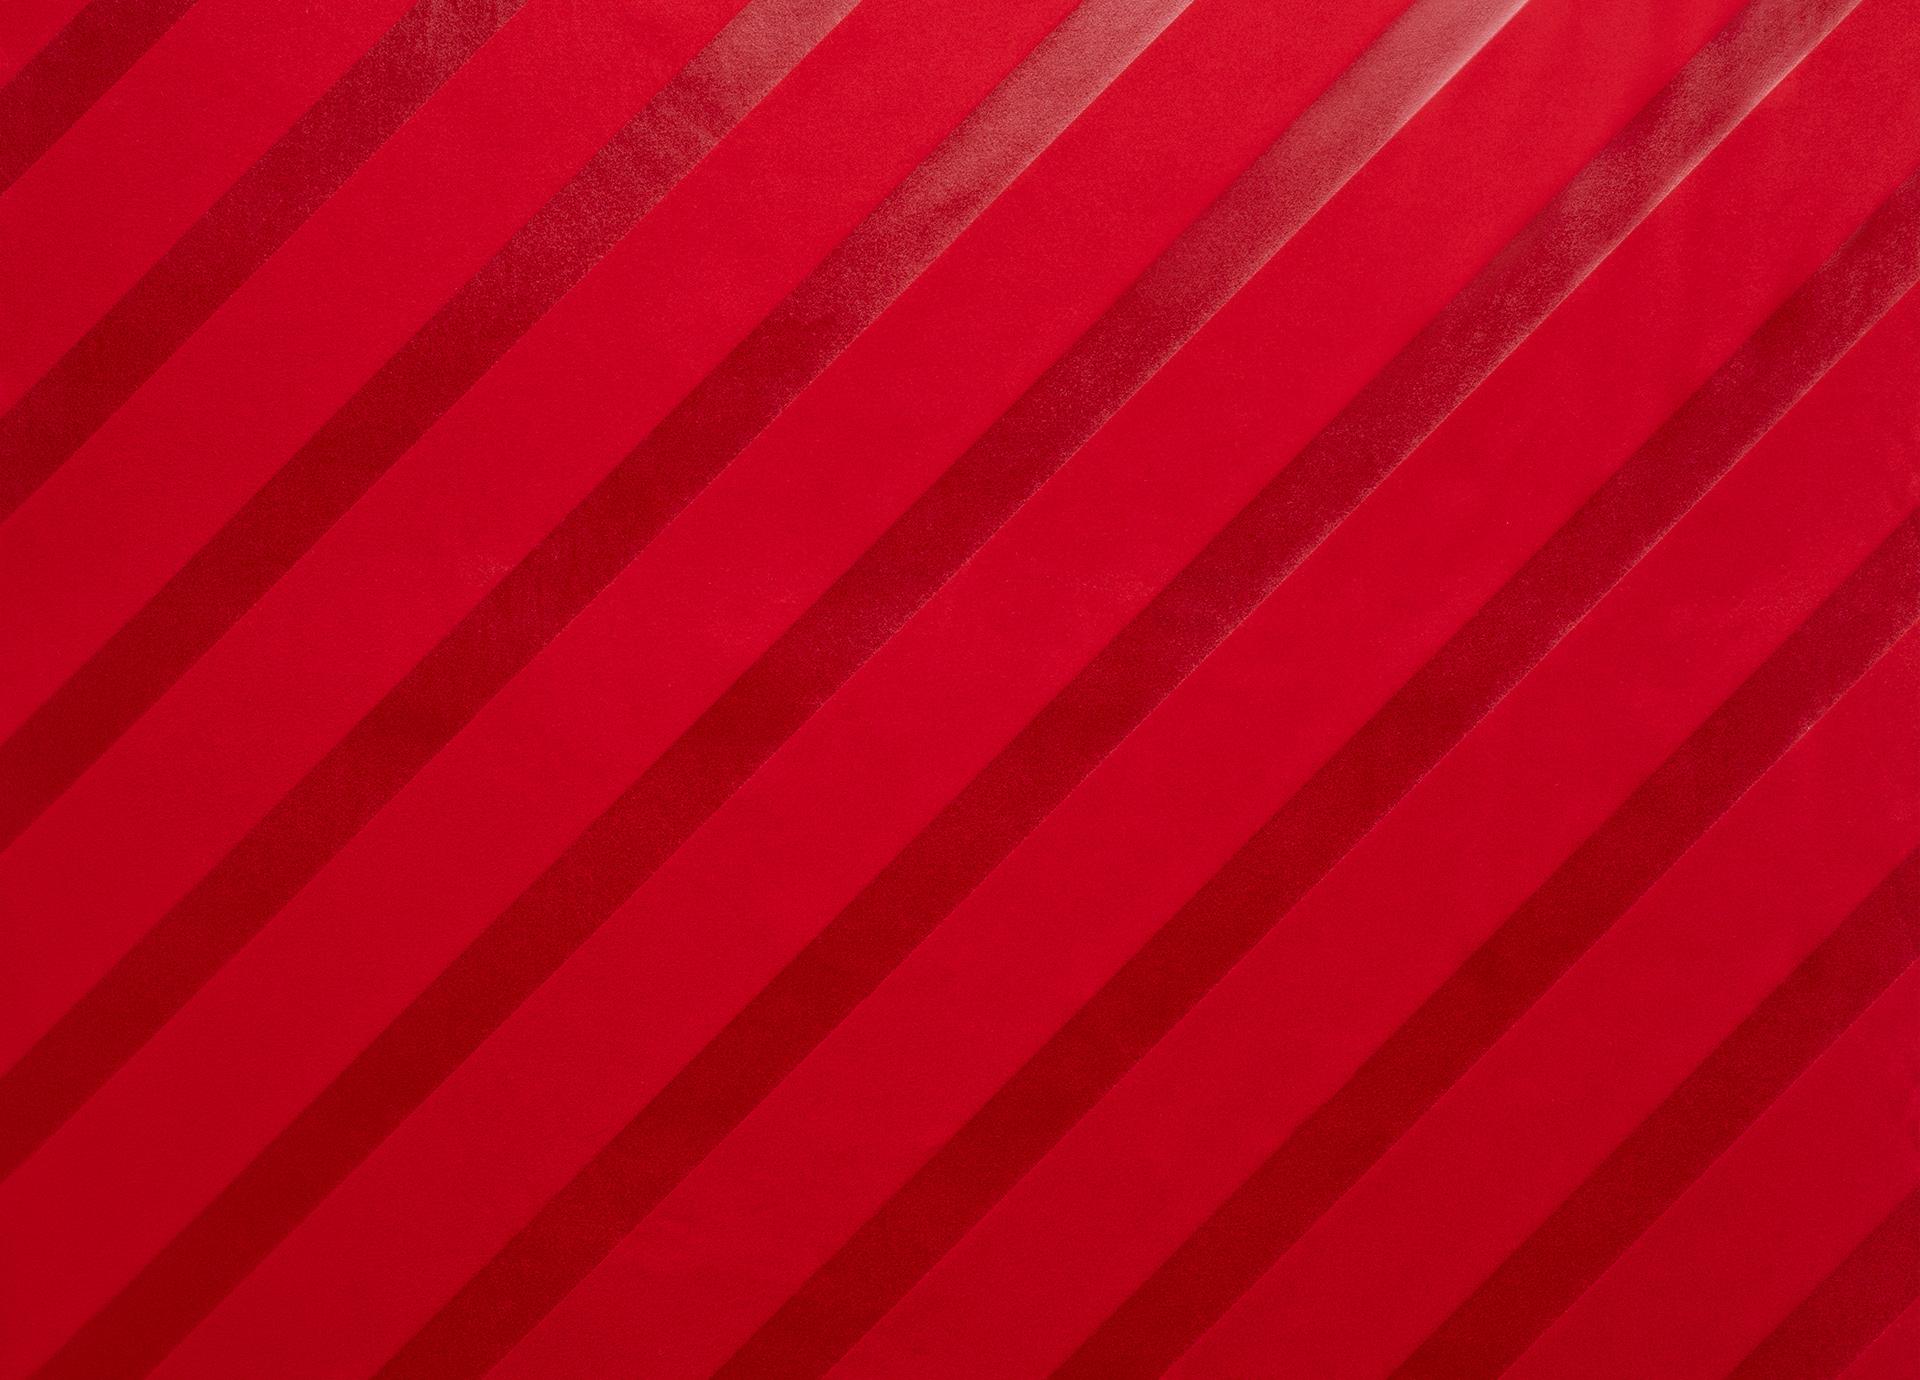 RED REGIMENTAL